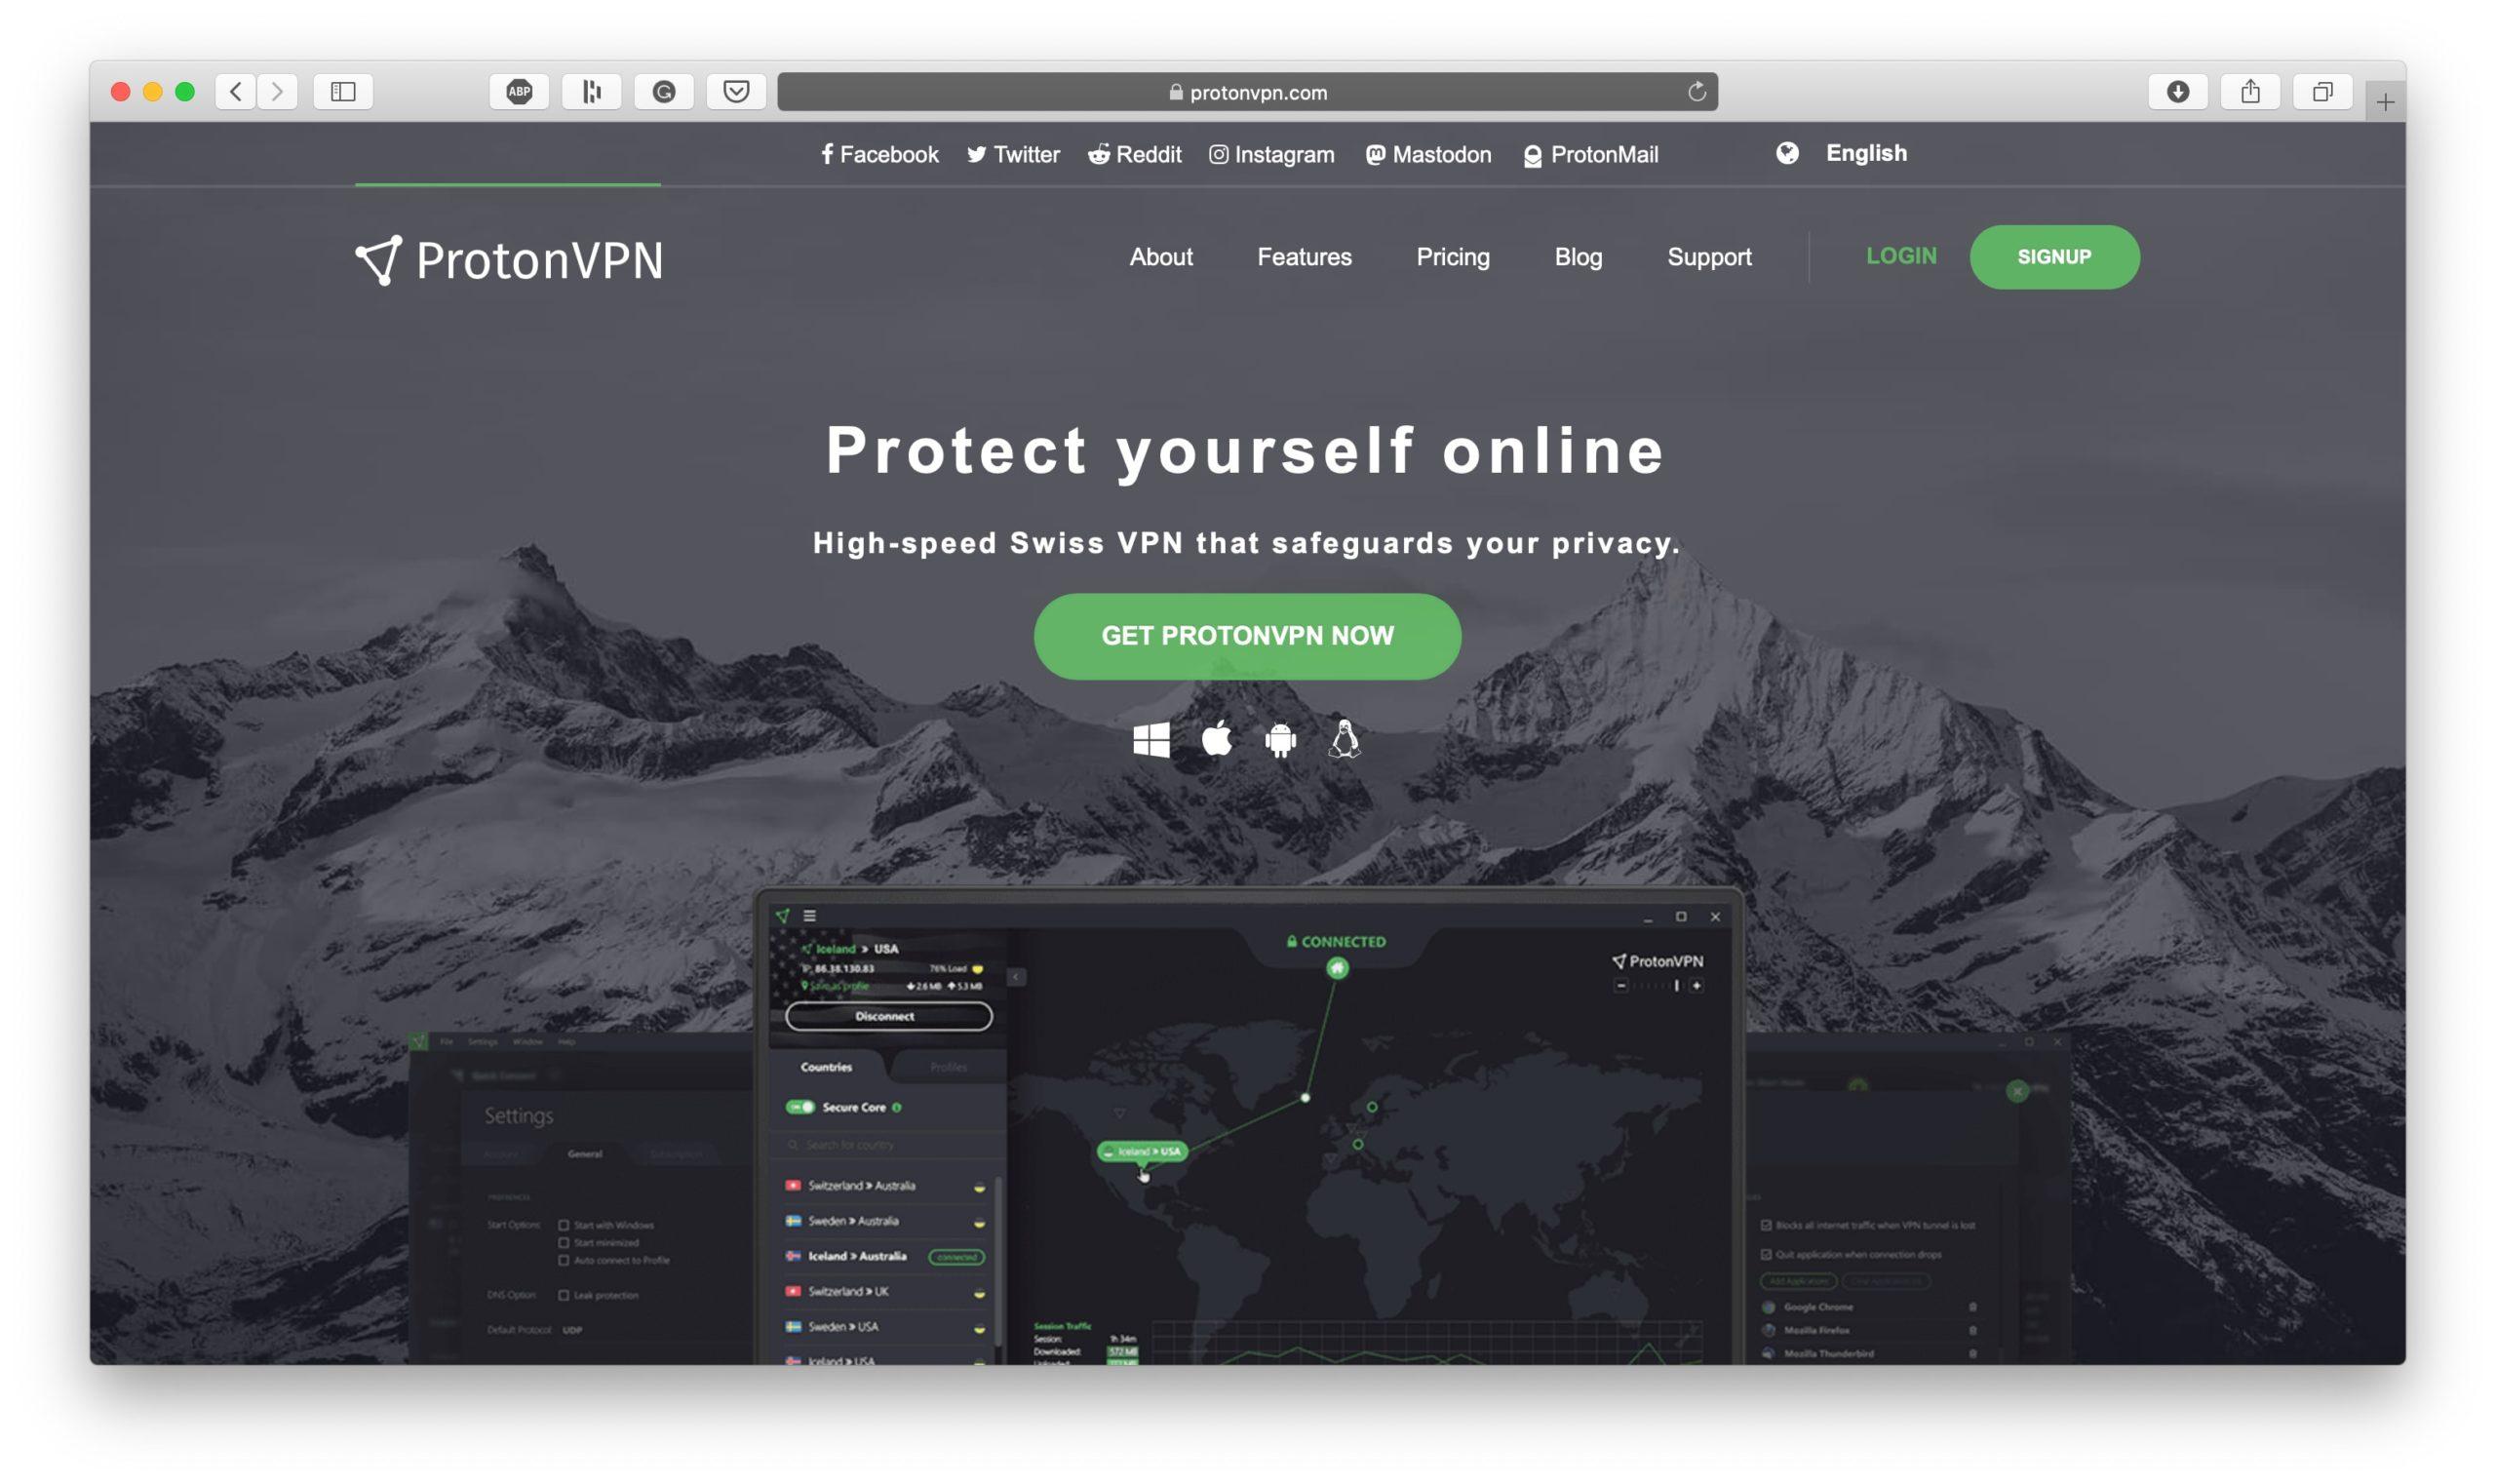 ProtonVPN Productivty App